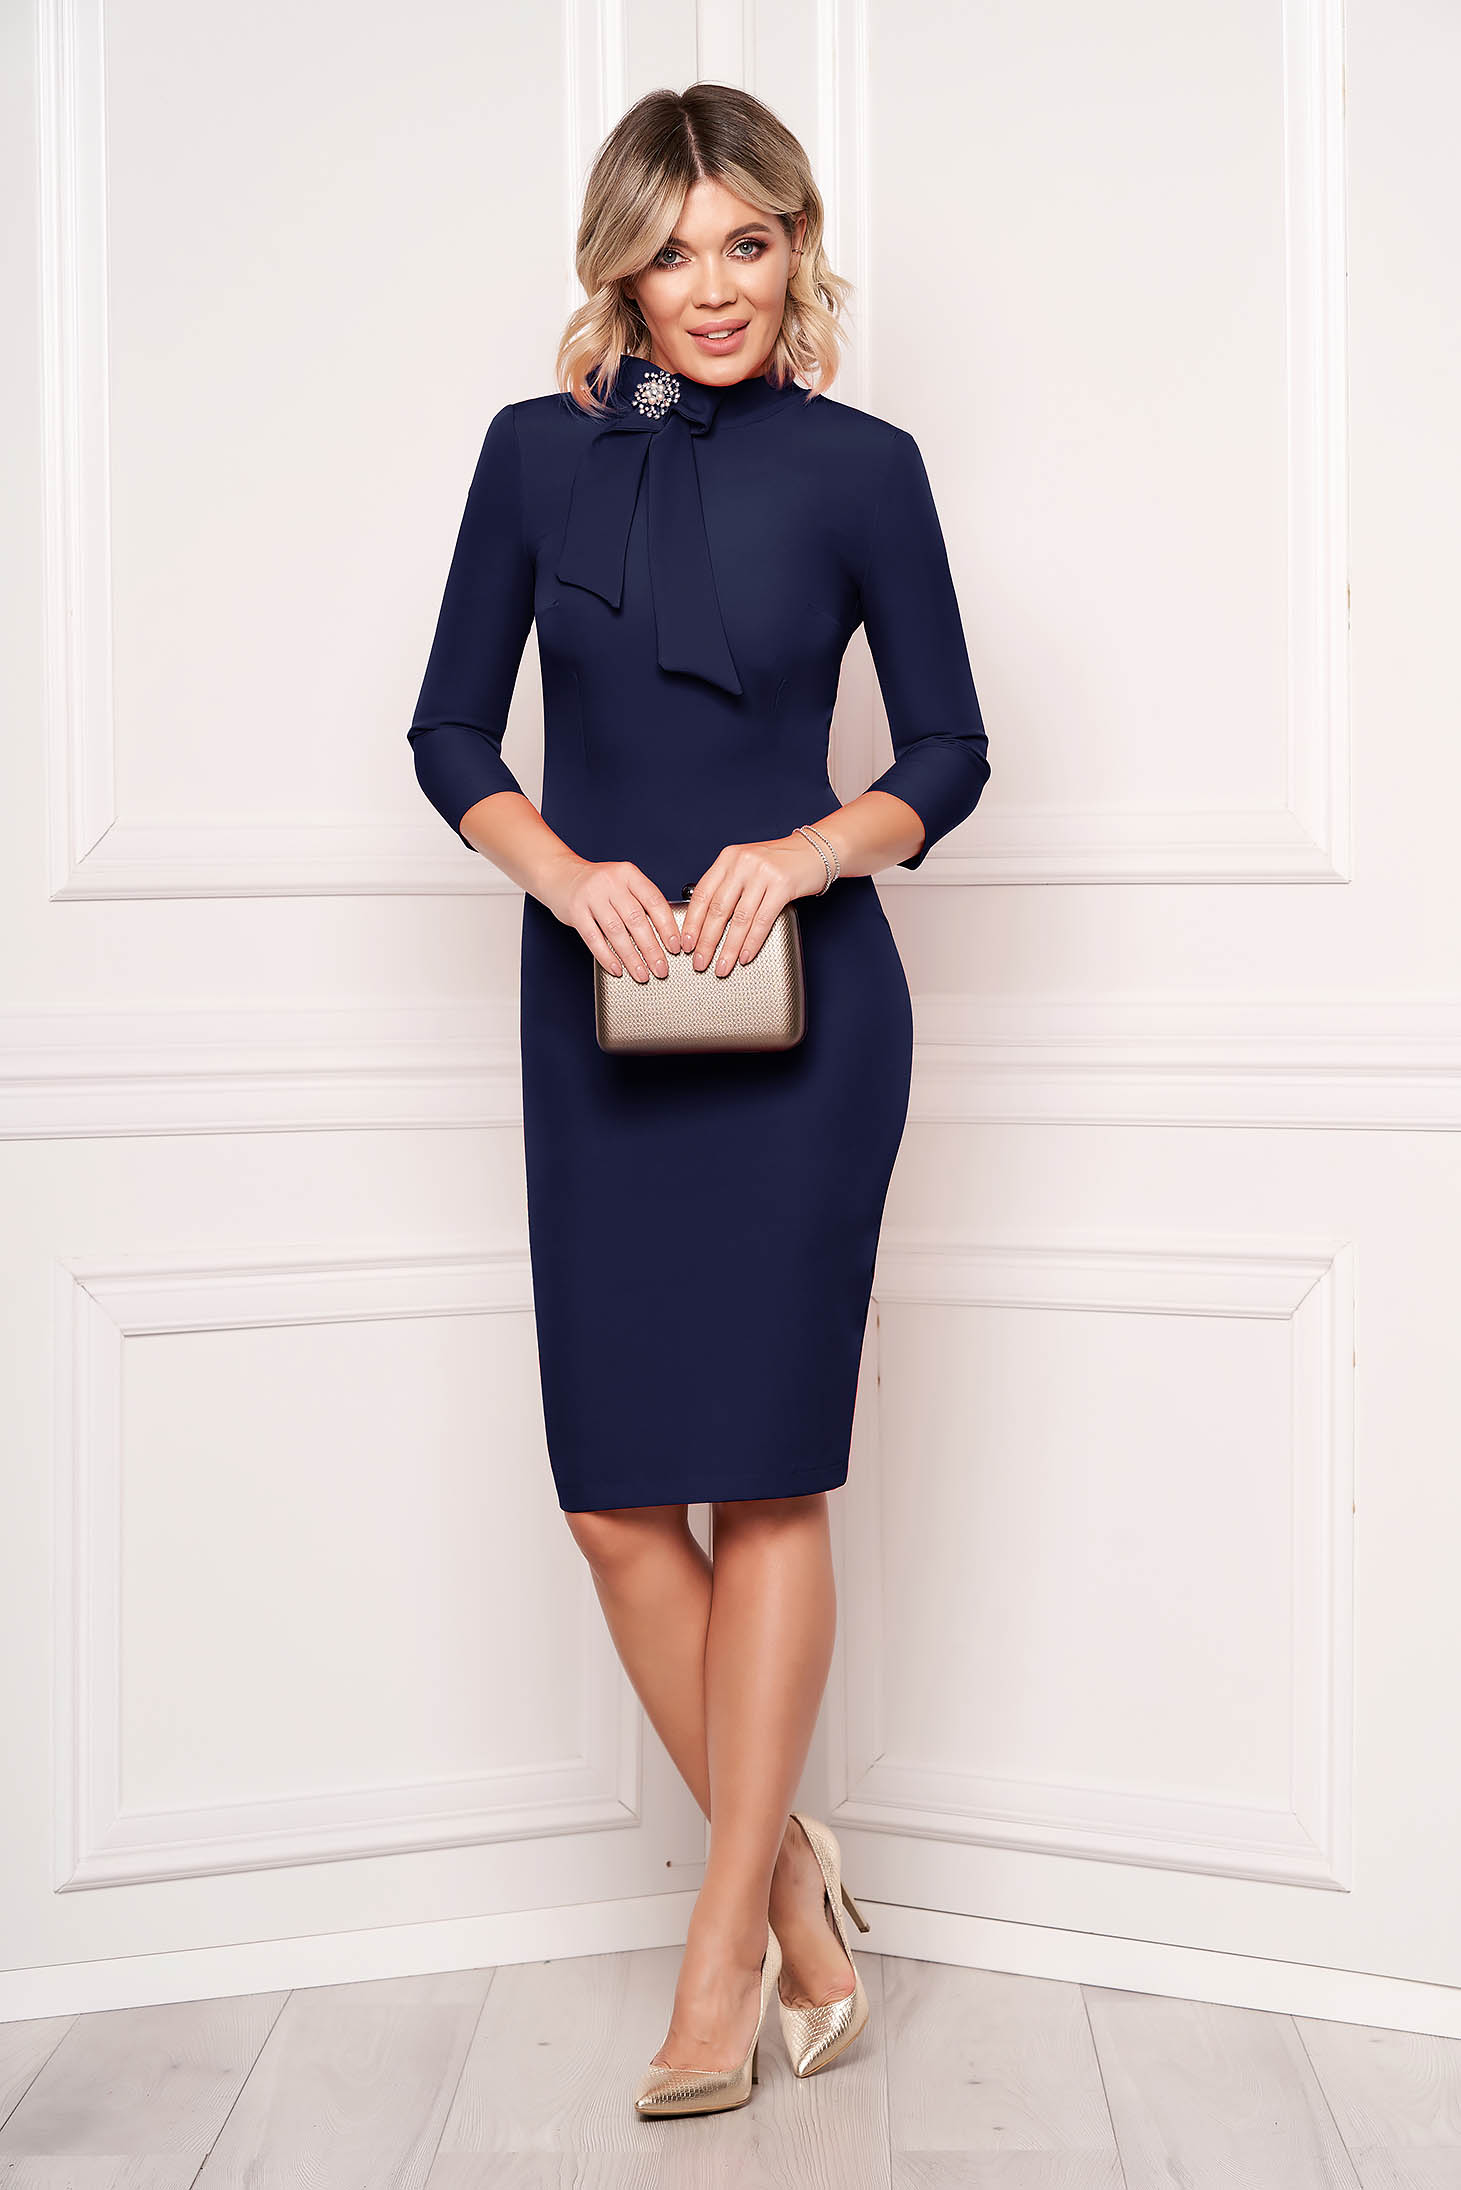 Rochie StarShinerS albastru-inchis eleganta office midi din stofa elastic